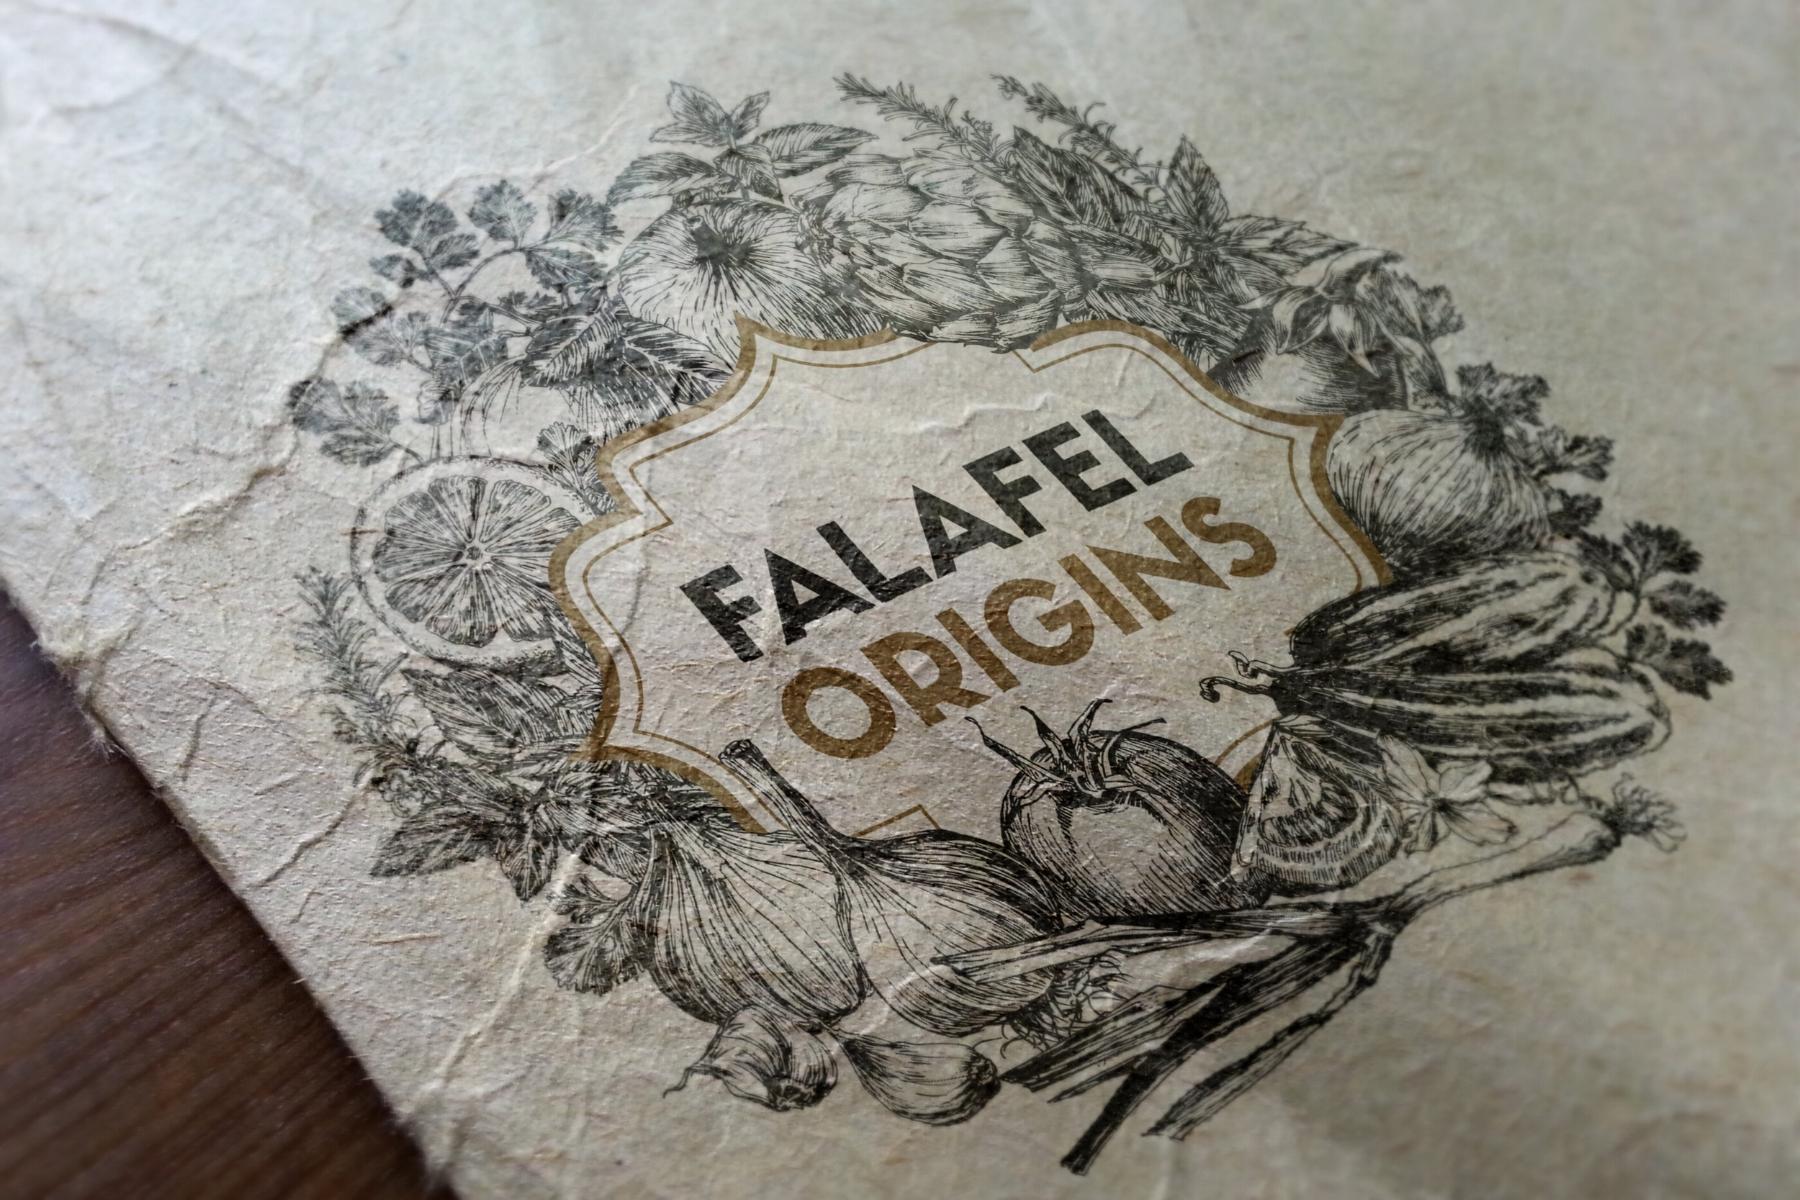 Falafel Origins Restaurant